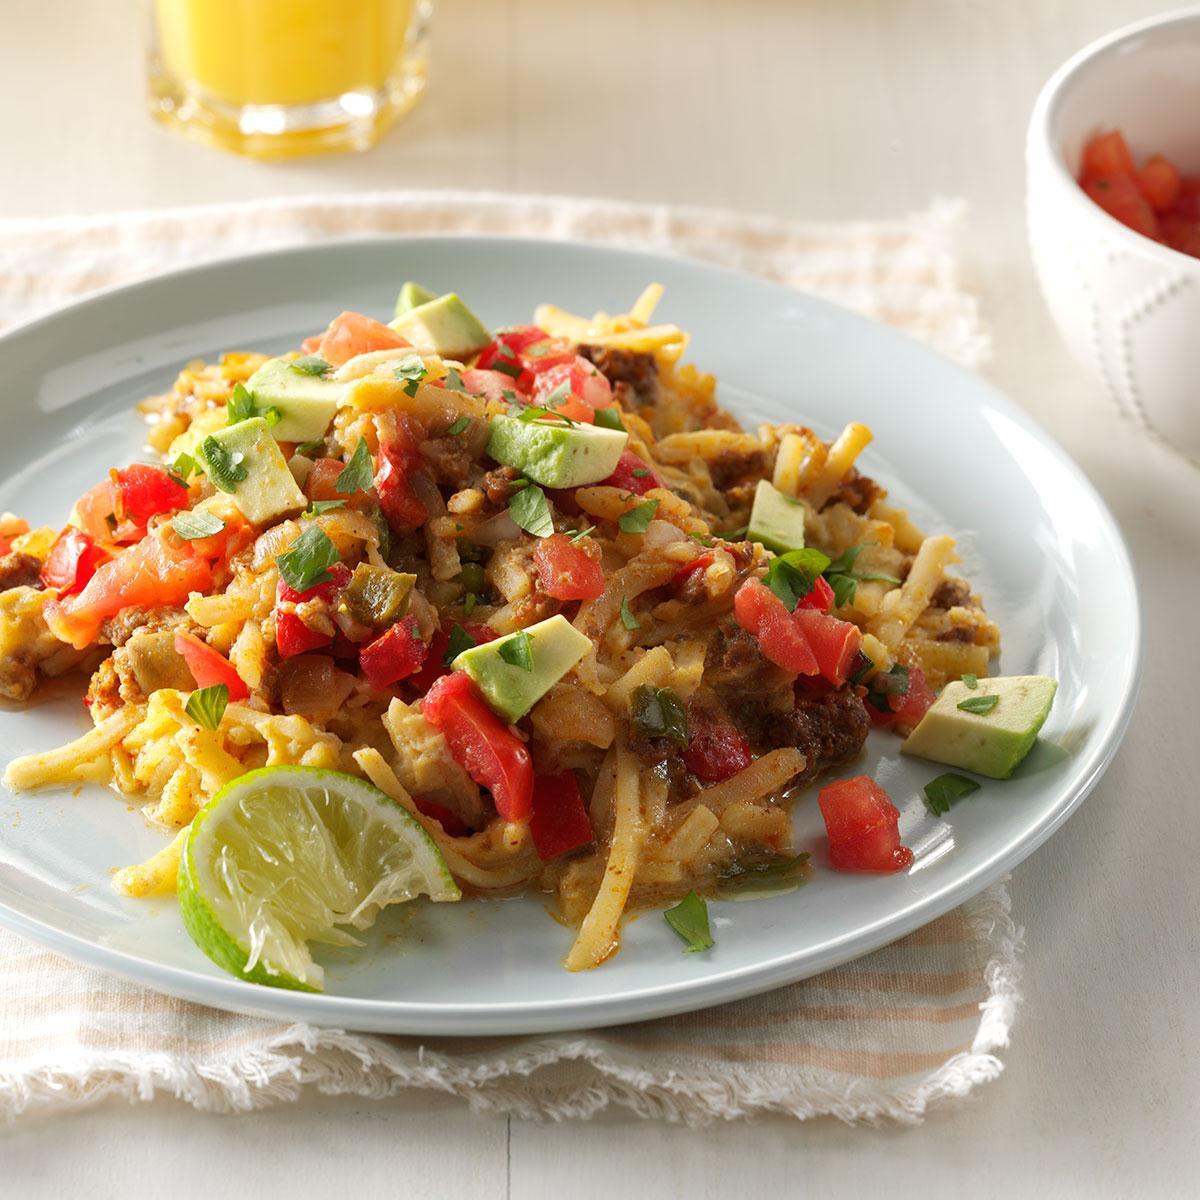 Chorizo Breakfast Recipes  Slow Cooker Chorizo Breakfast Casserole Recipe